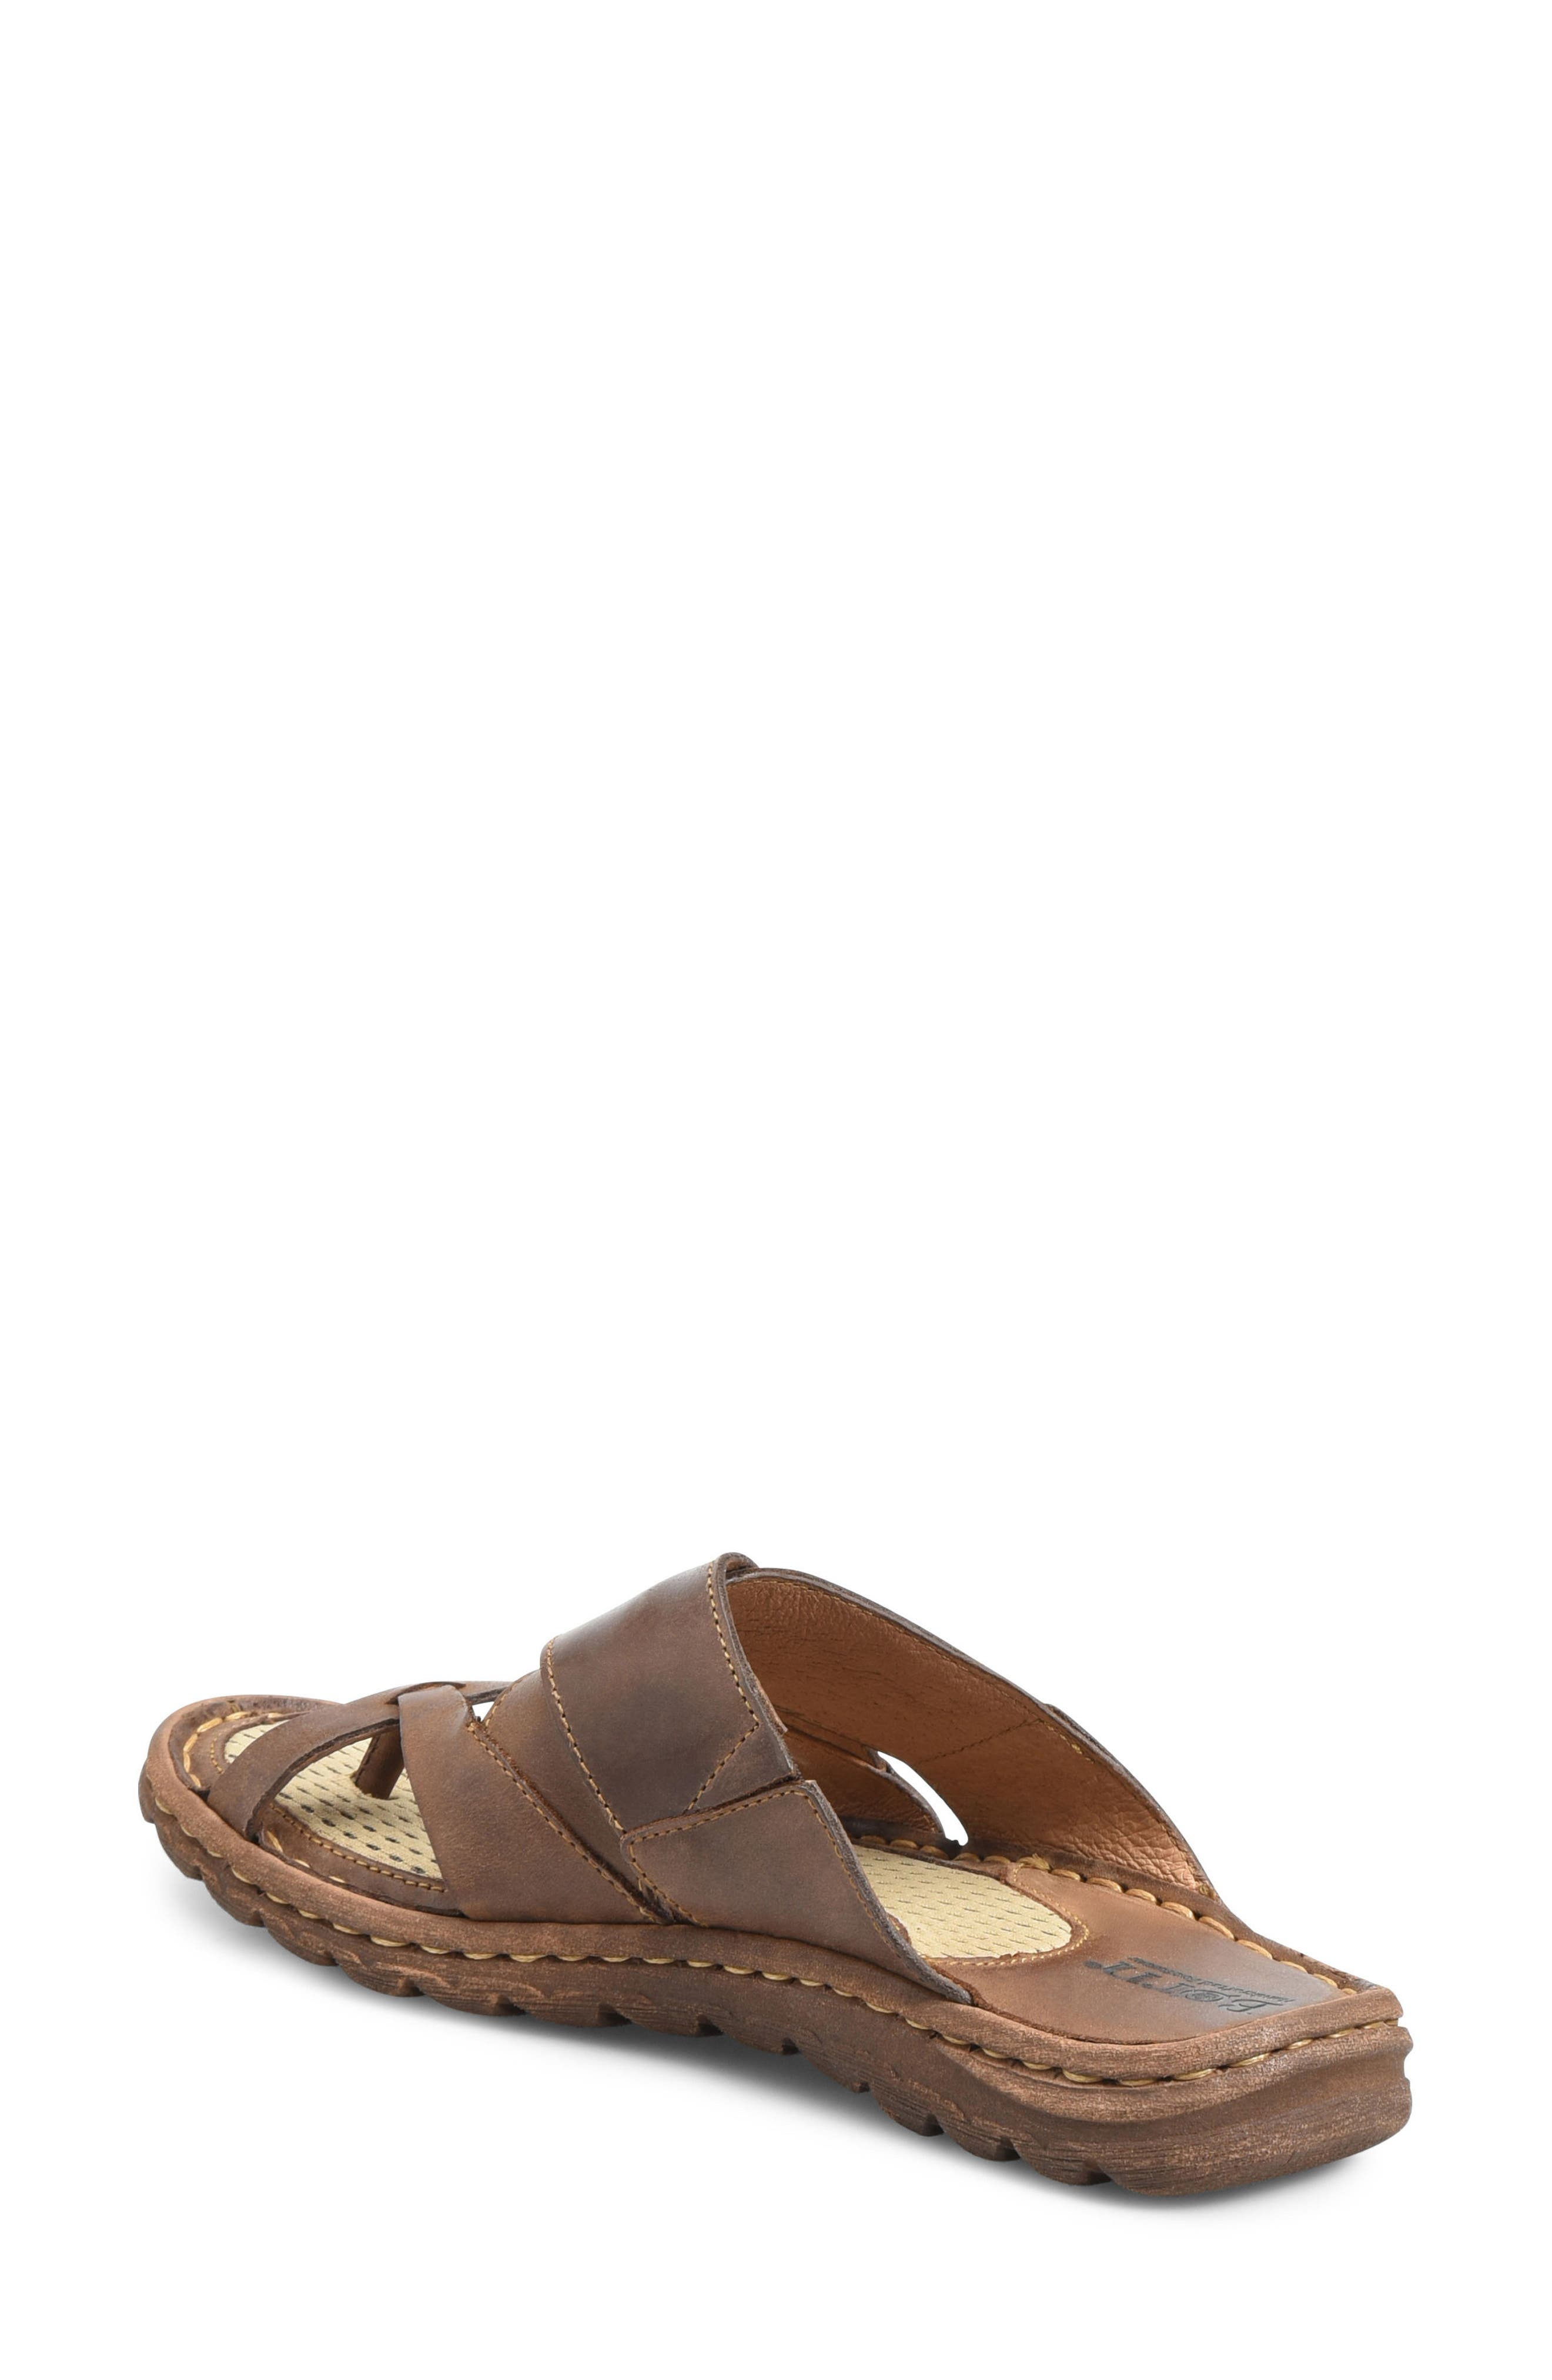 'Sorja' Leather Sandal,                             Alternate thumbnail 2, color,                             DARK BROWN LEATHER